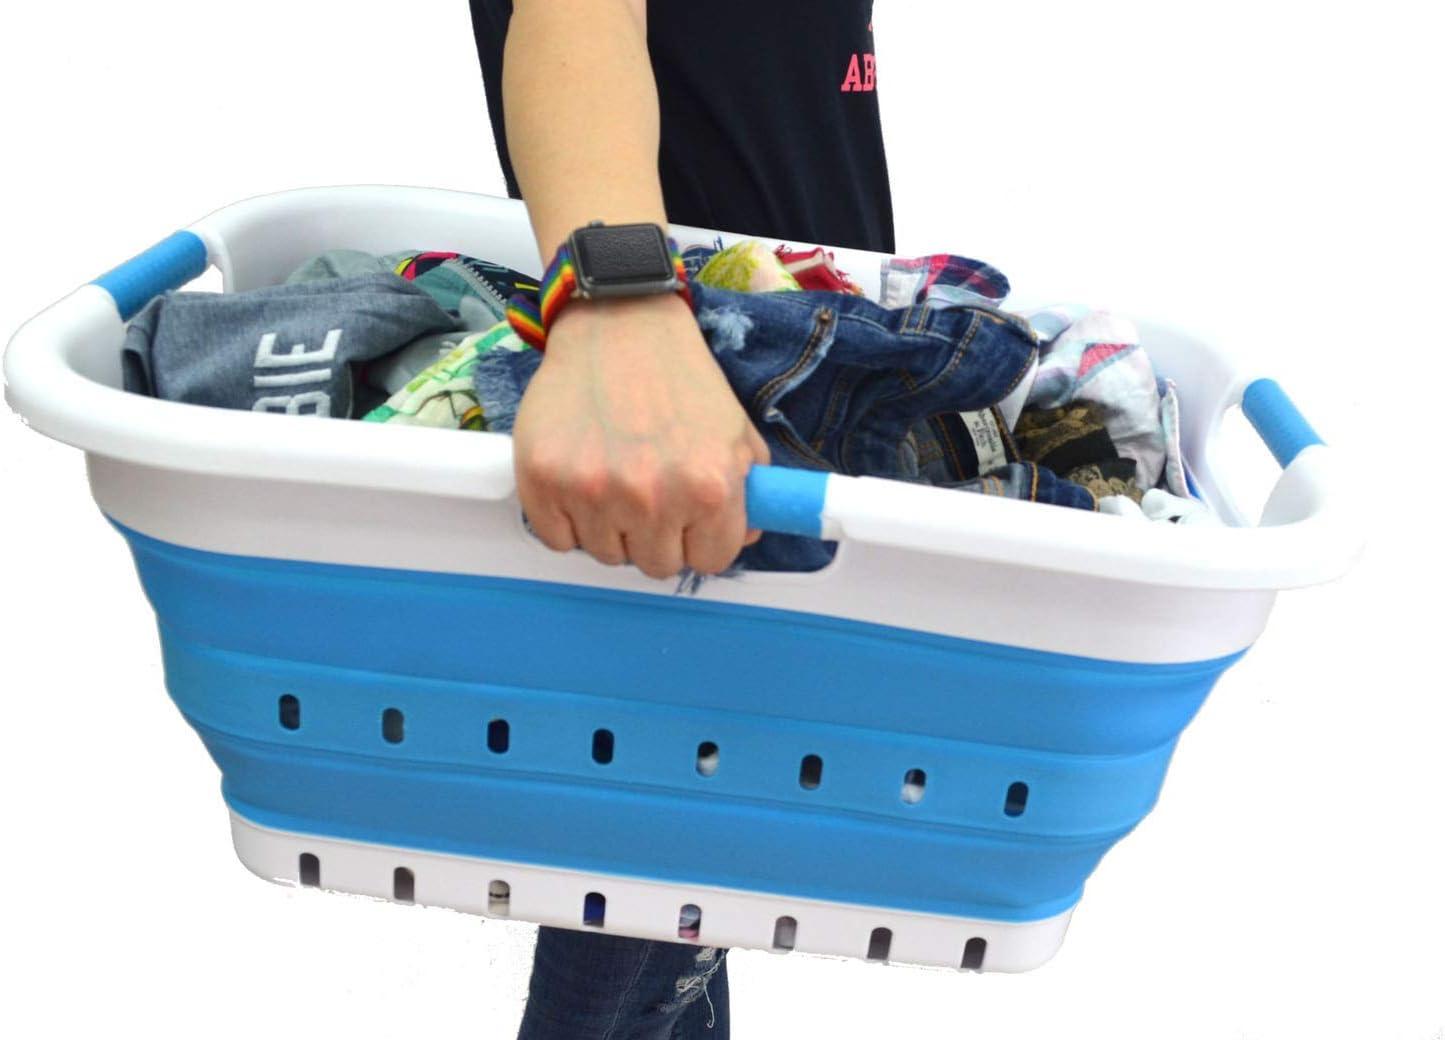 Space Saving Hamper//Basket Rectangular, Lt. Purple SAMMART Collapsible Plastic Laundry Basket Portable Washing Tub Foldable Pop Up Storage Container//Organizer